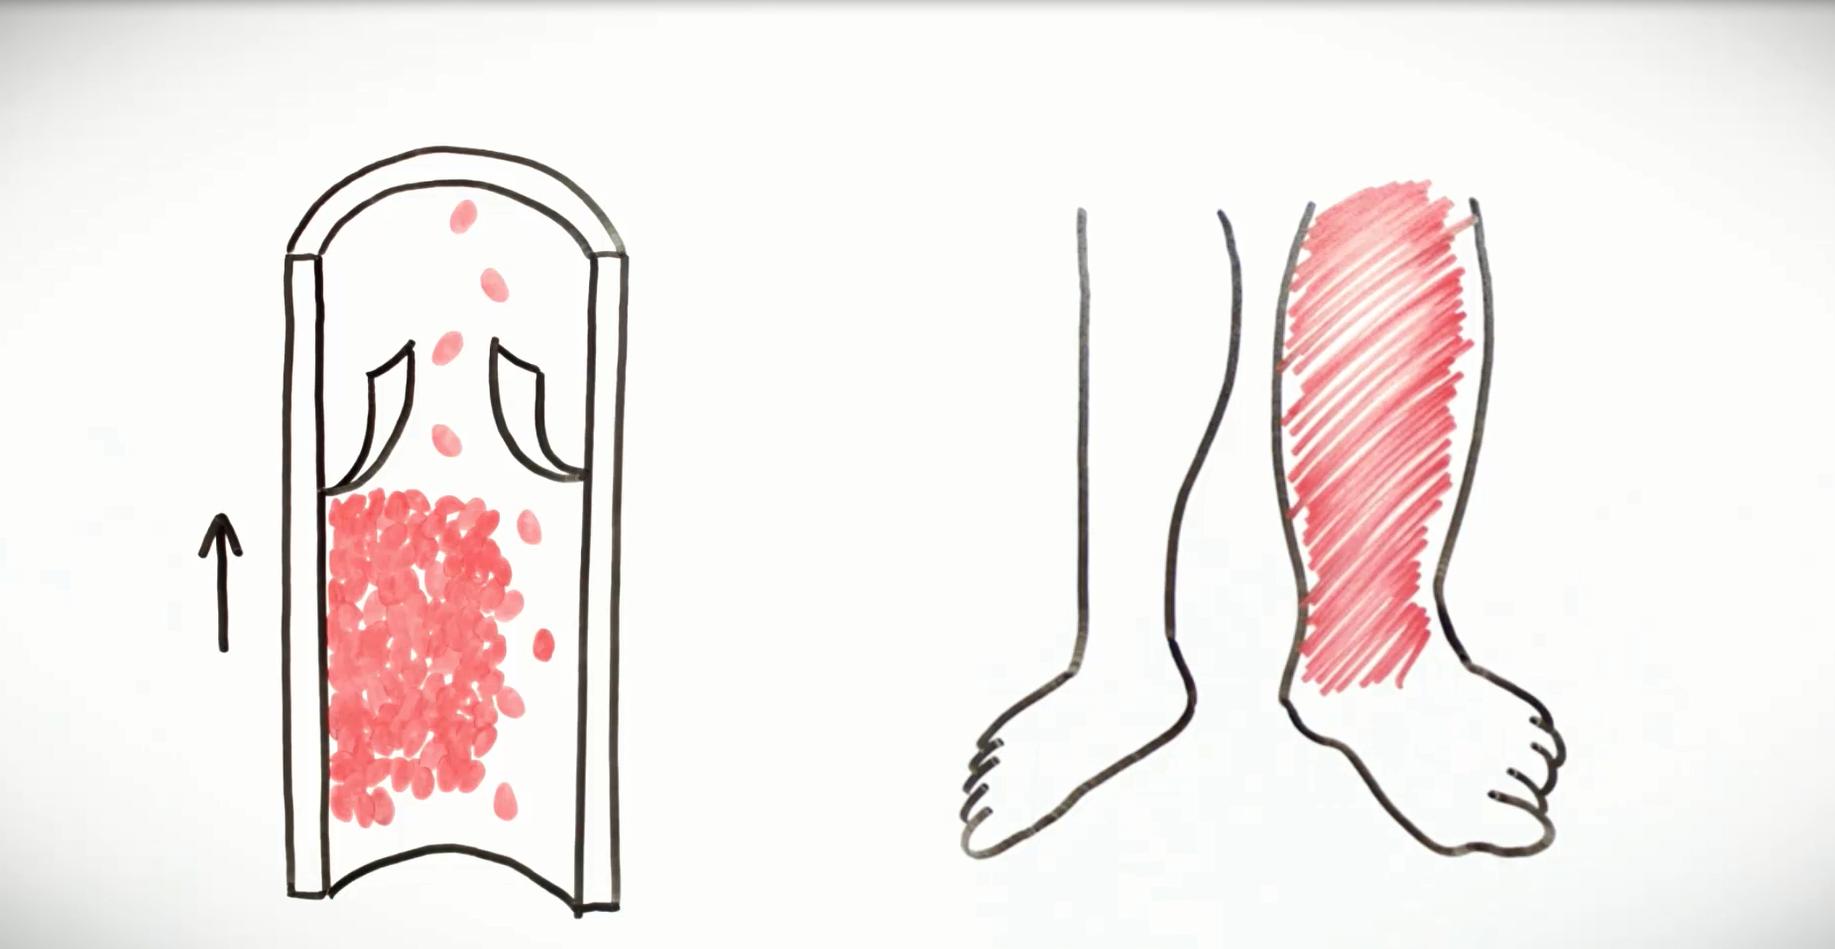 Symptomer dyp venetrombose